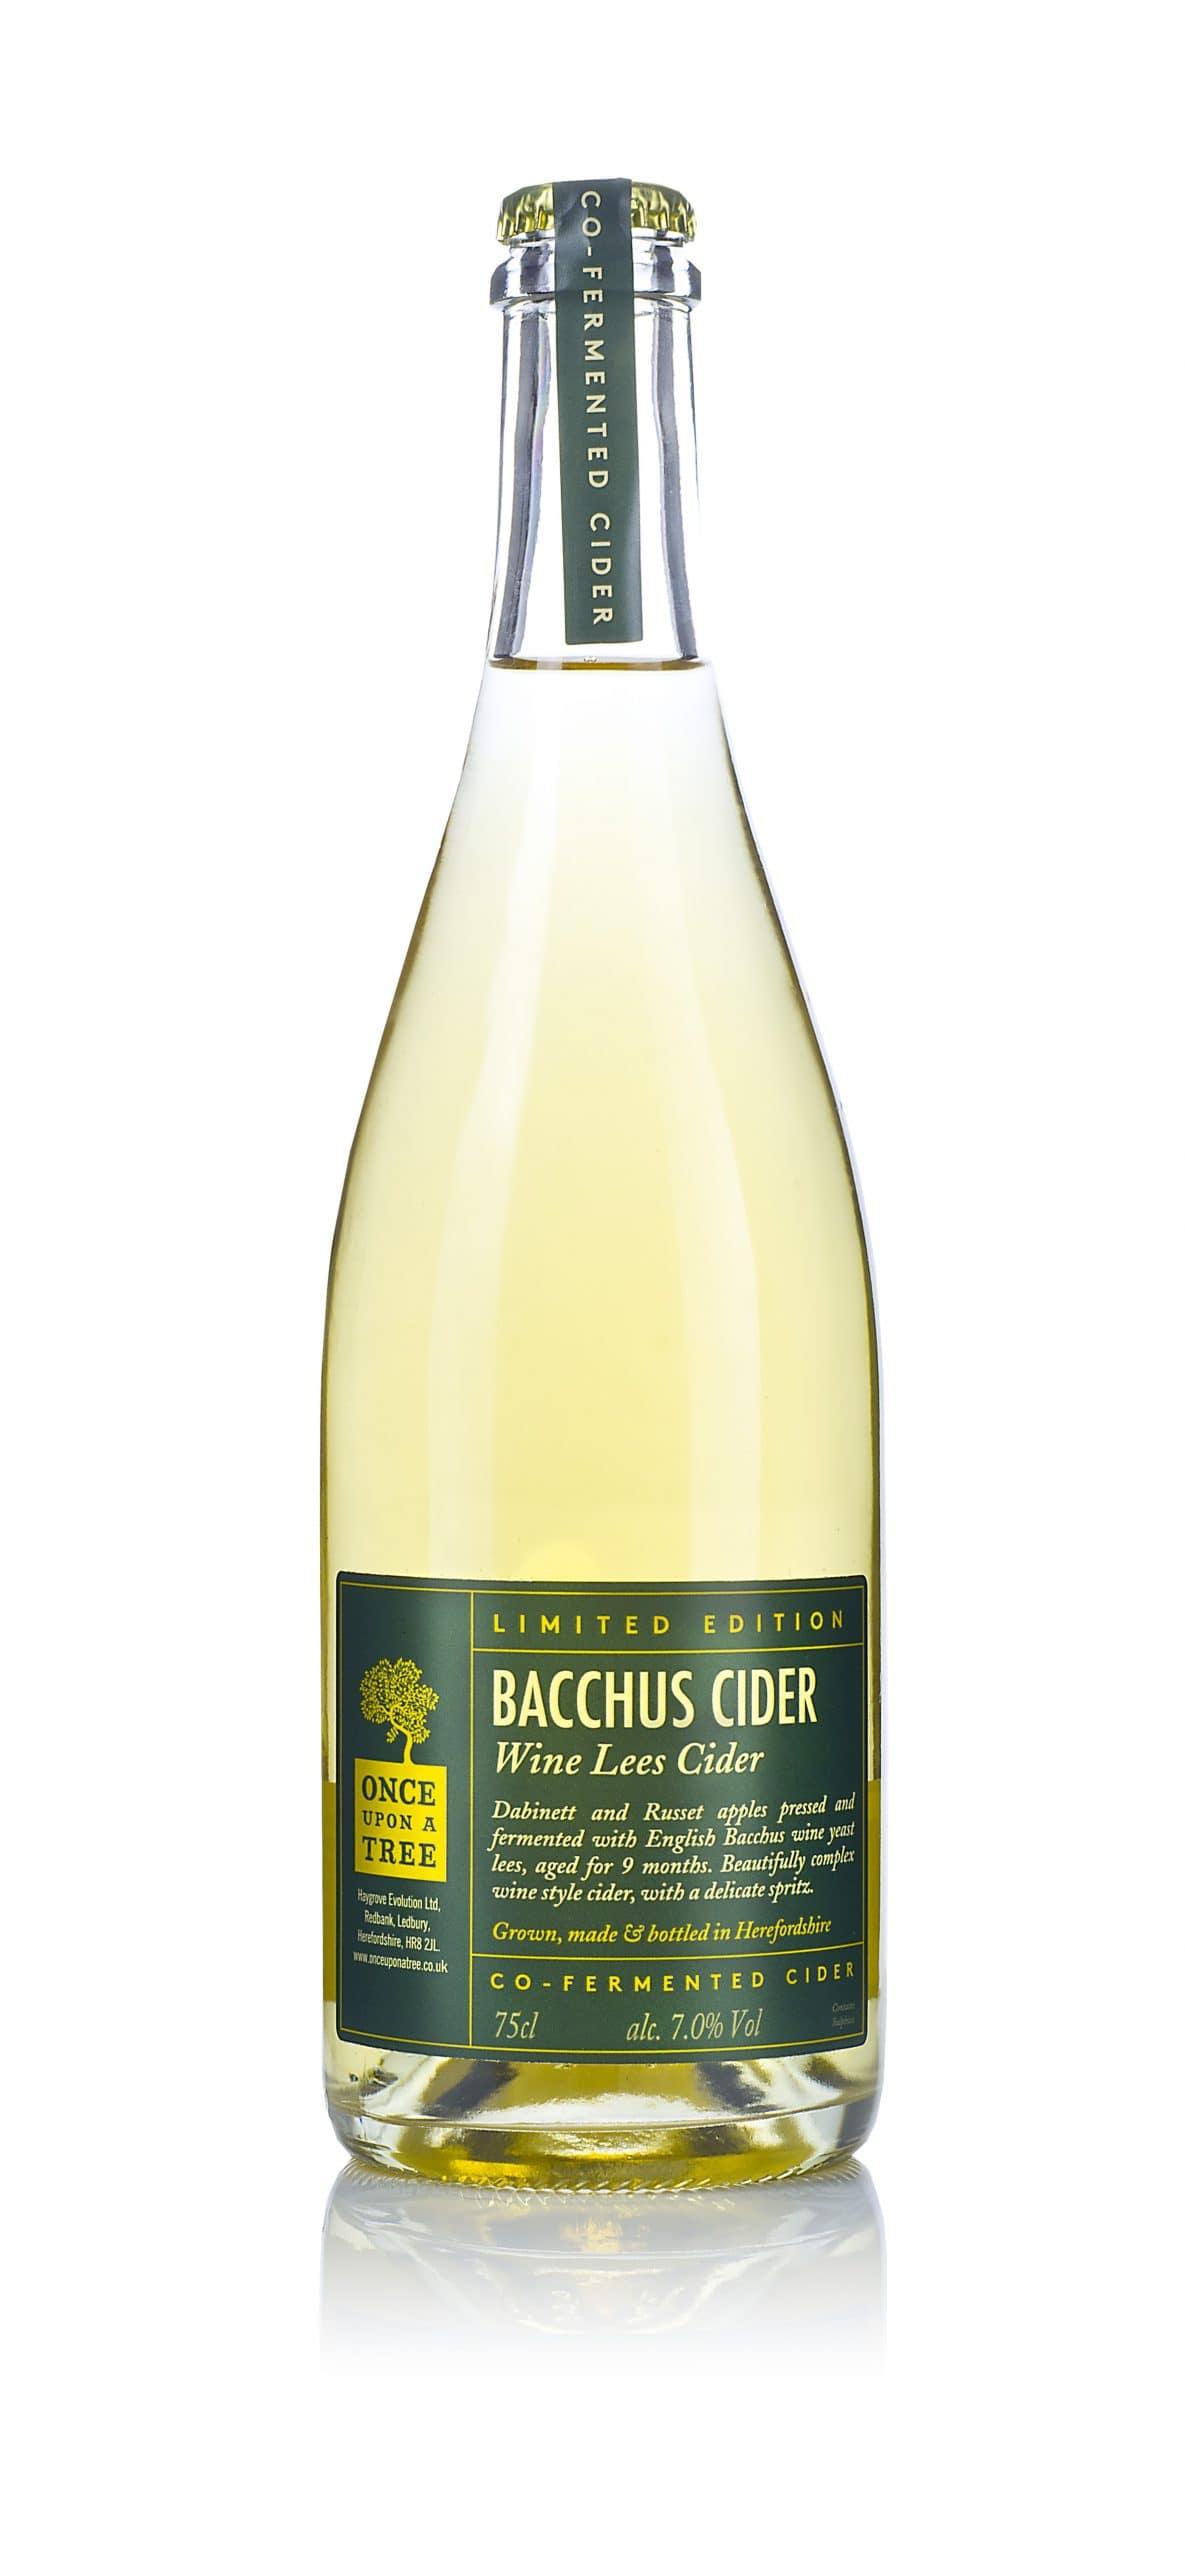 Once Upon A Tree Bacchus Co-Ferment 2018: 6 Bottle Case